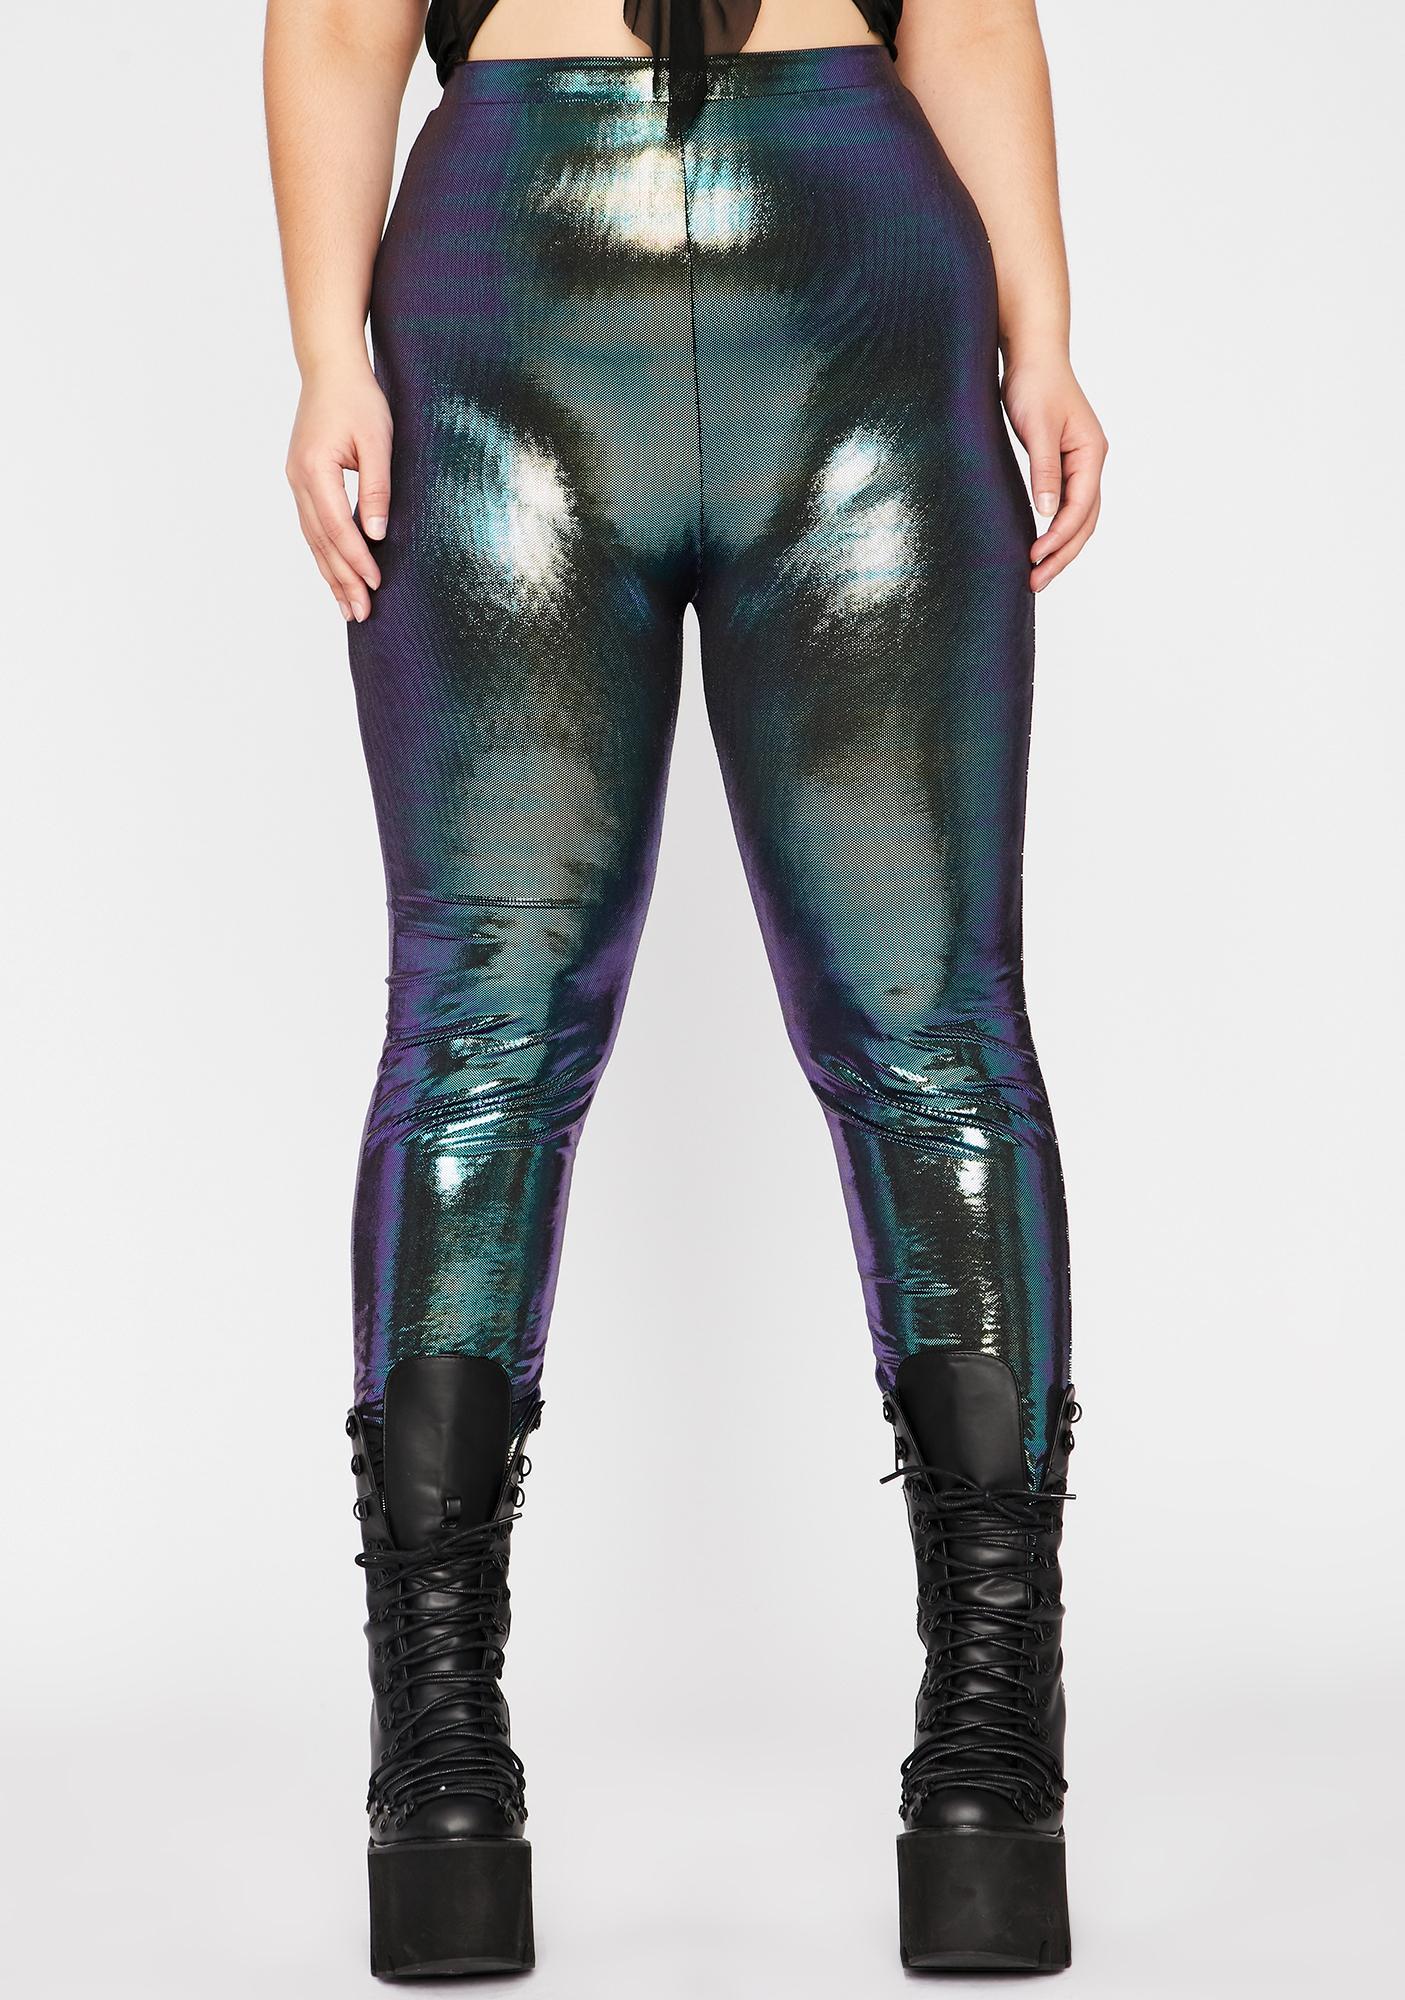 Epic Mermaid Disco Dimension Metallic Leggings